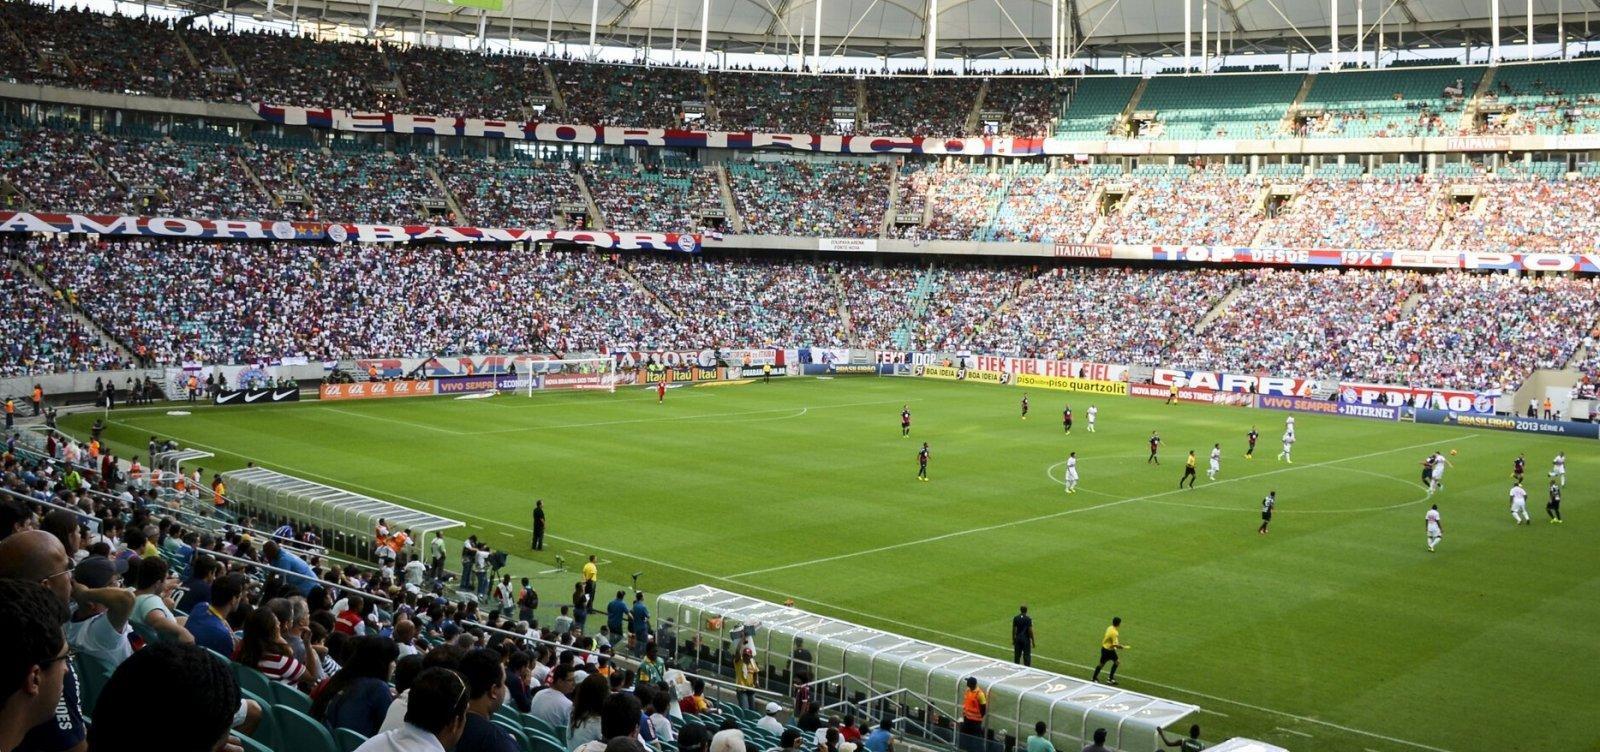 Rui Costa libera presença de público nos estádios limitado a 30% da capacidade